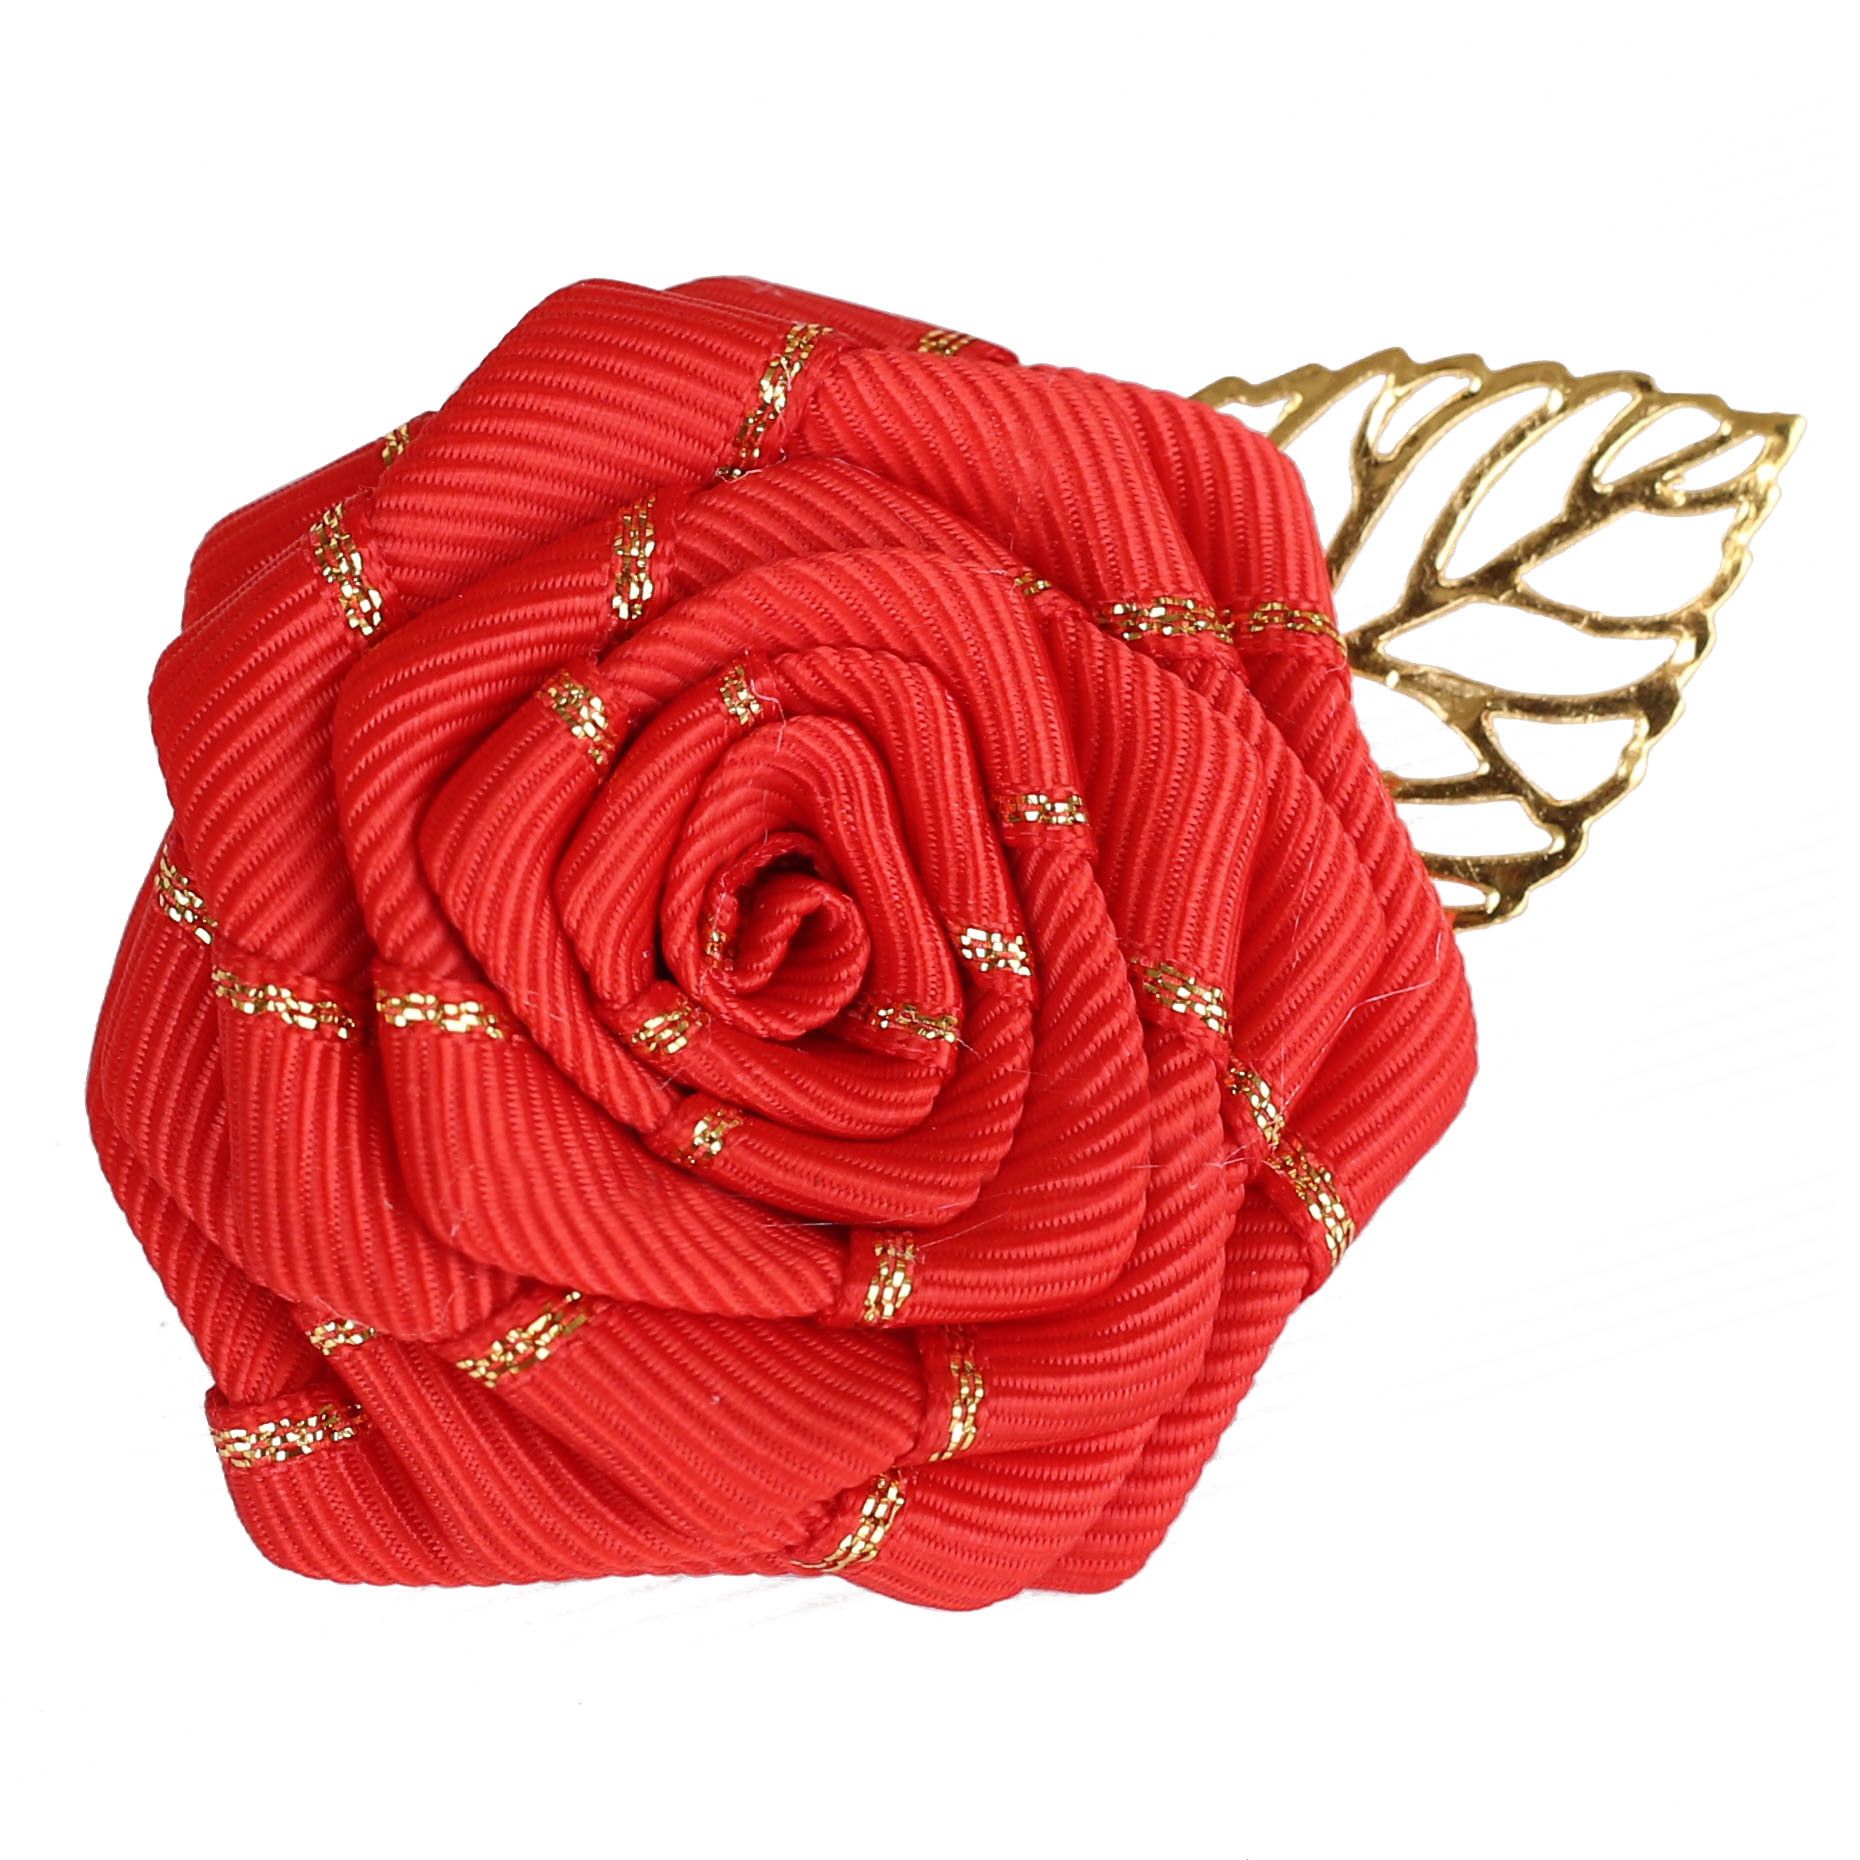 7piece/lot Wedding Prom Corsage Ceremony Flower Brooch Groom Groomsmen Satin Rose Buttonhole Flowers Boutonniere Handmade XH039B